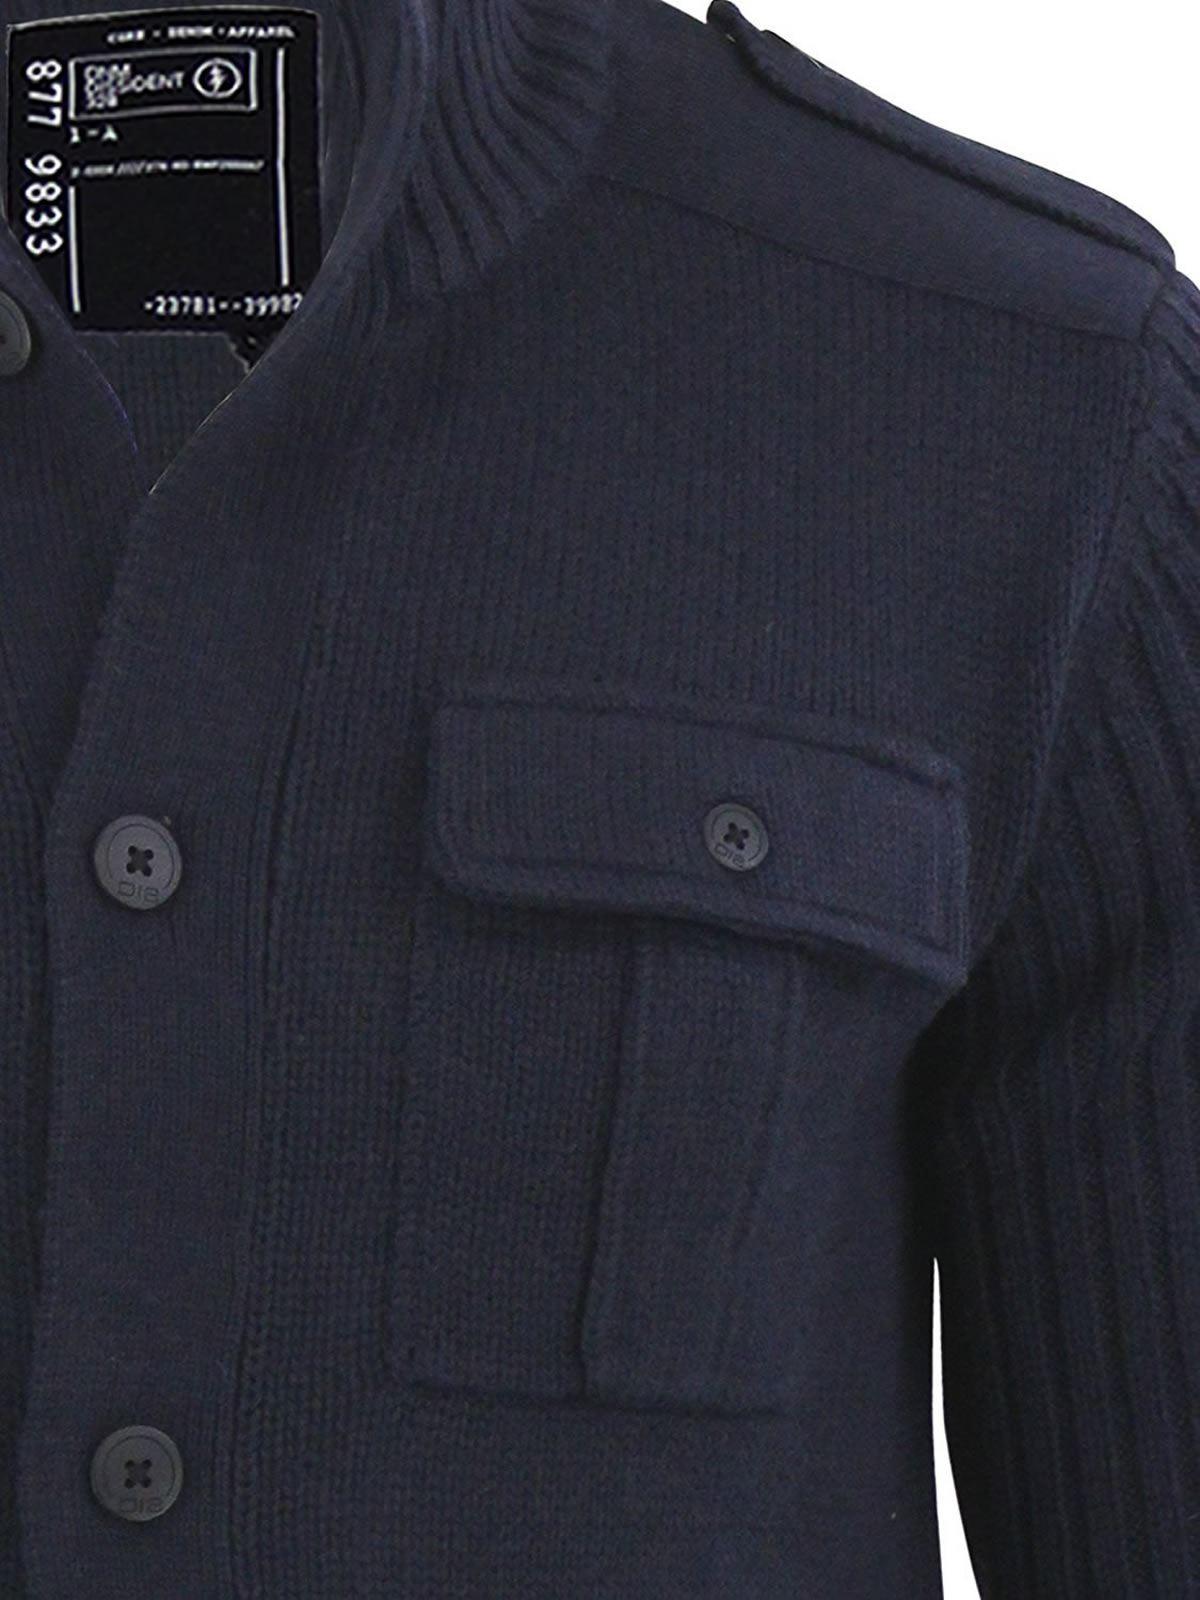 595d40e8267b3 Dissident Brooke Mens Cardigan Jumper Button Up Funnel Neck Sweater ...